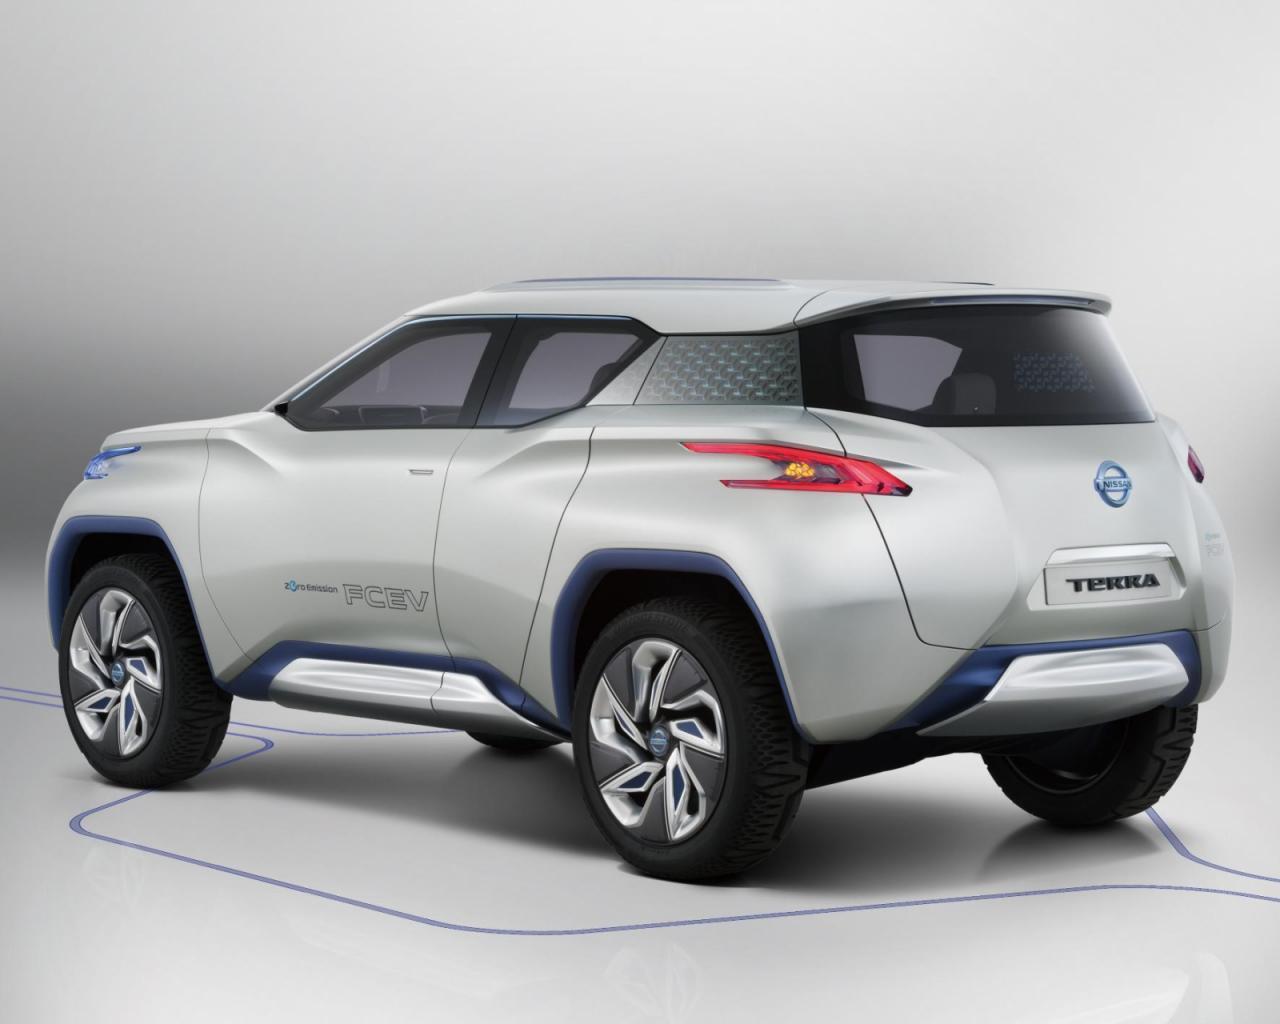 [Resim: Nissan+TeRRA+2.jpg]